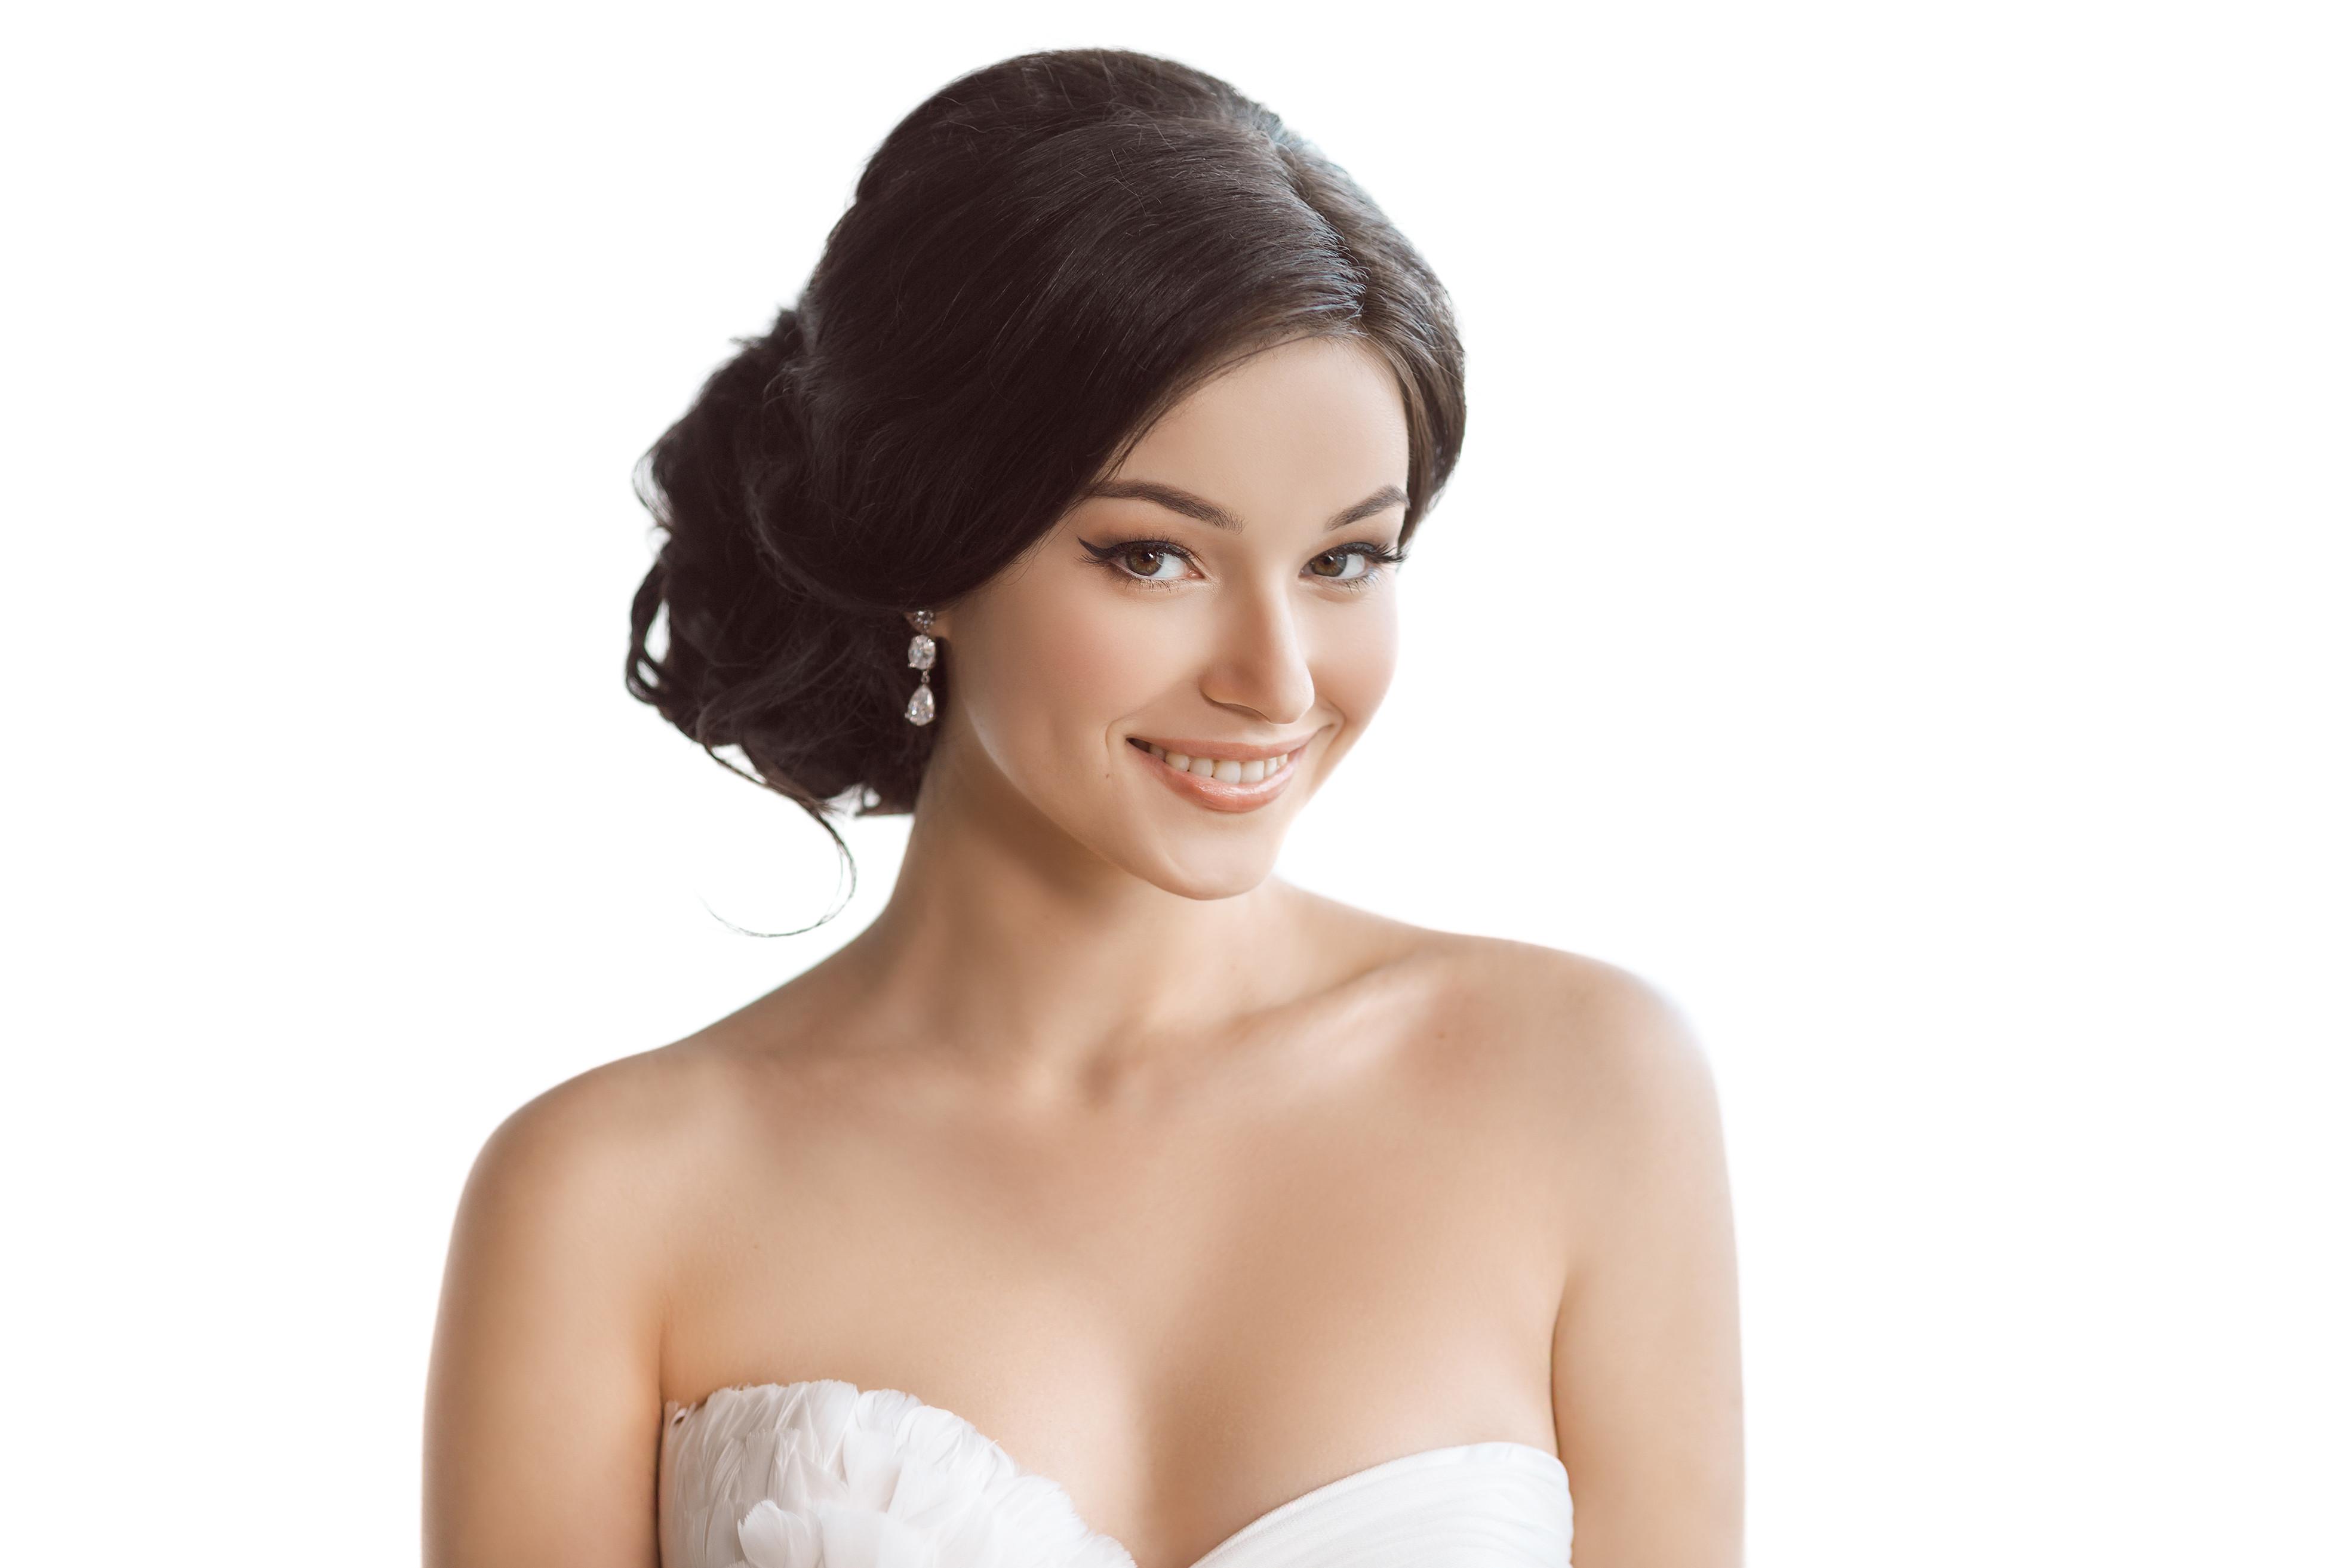 coiffure mariée - agde - chignon mariage - coiffure mariage